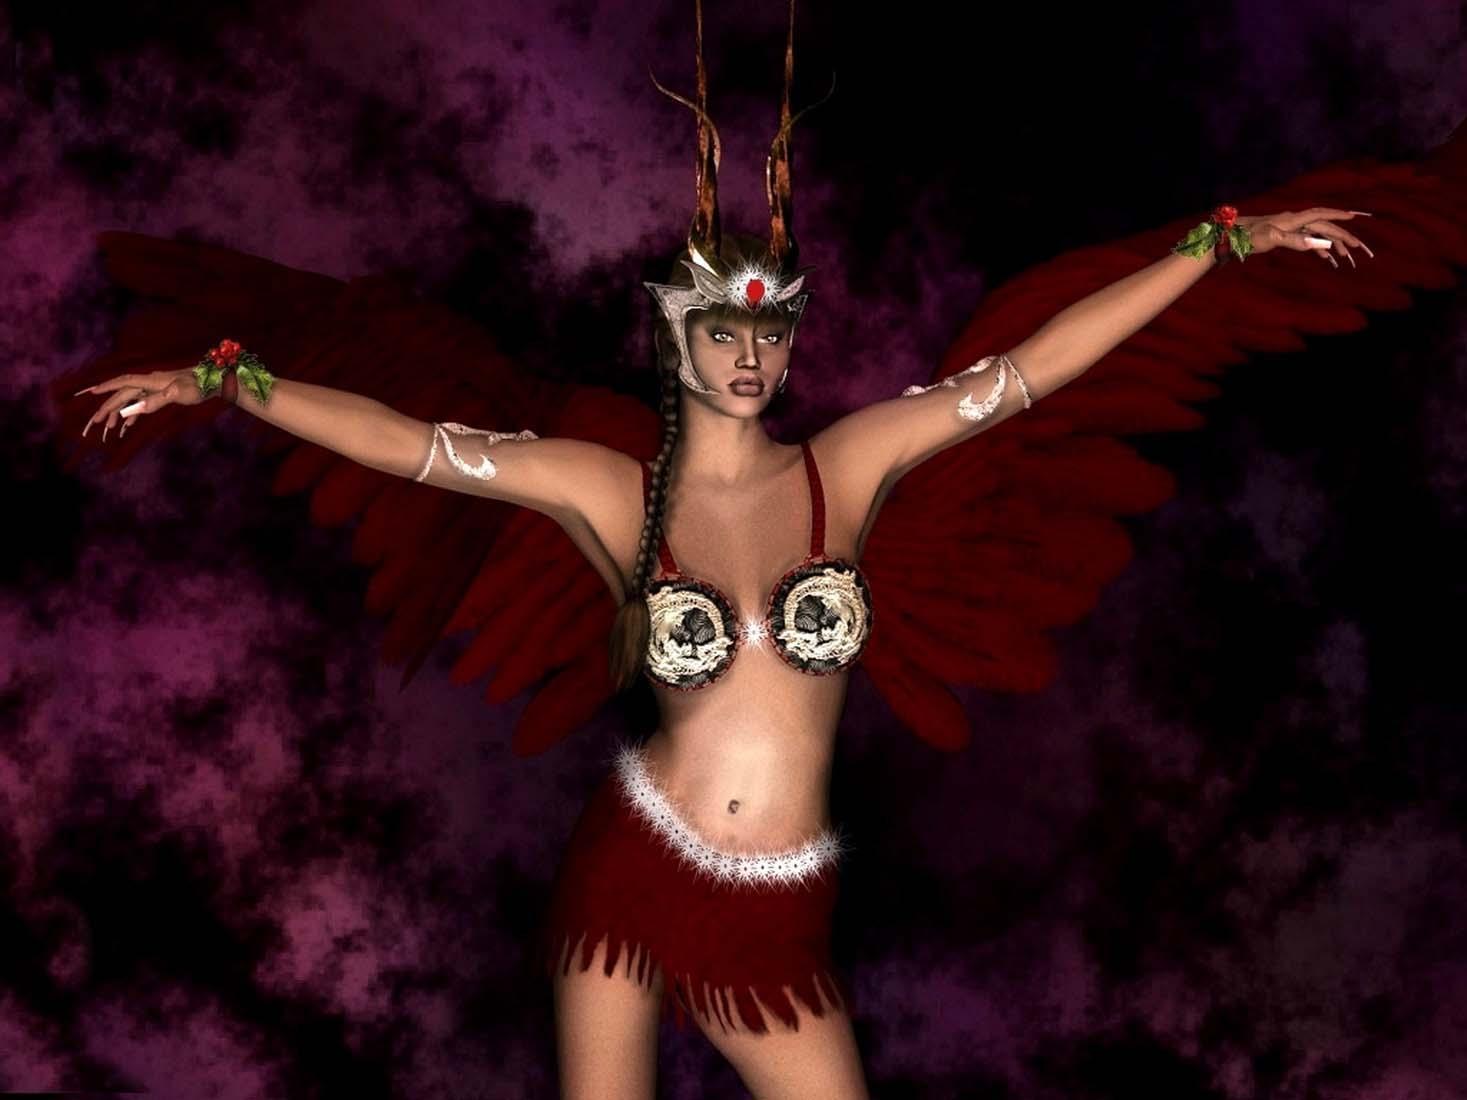 Nude voodoo wallpaper sex movie